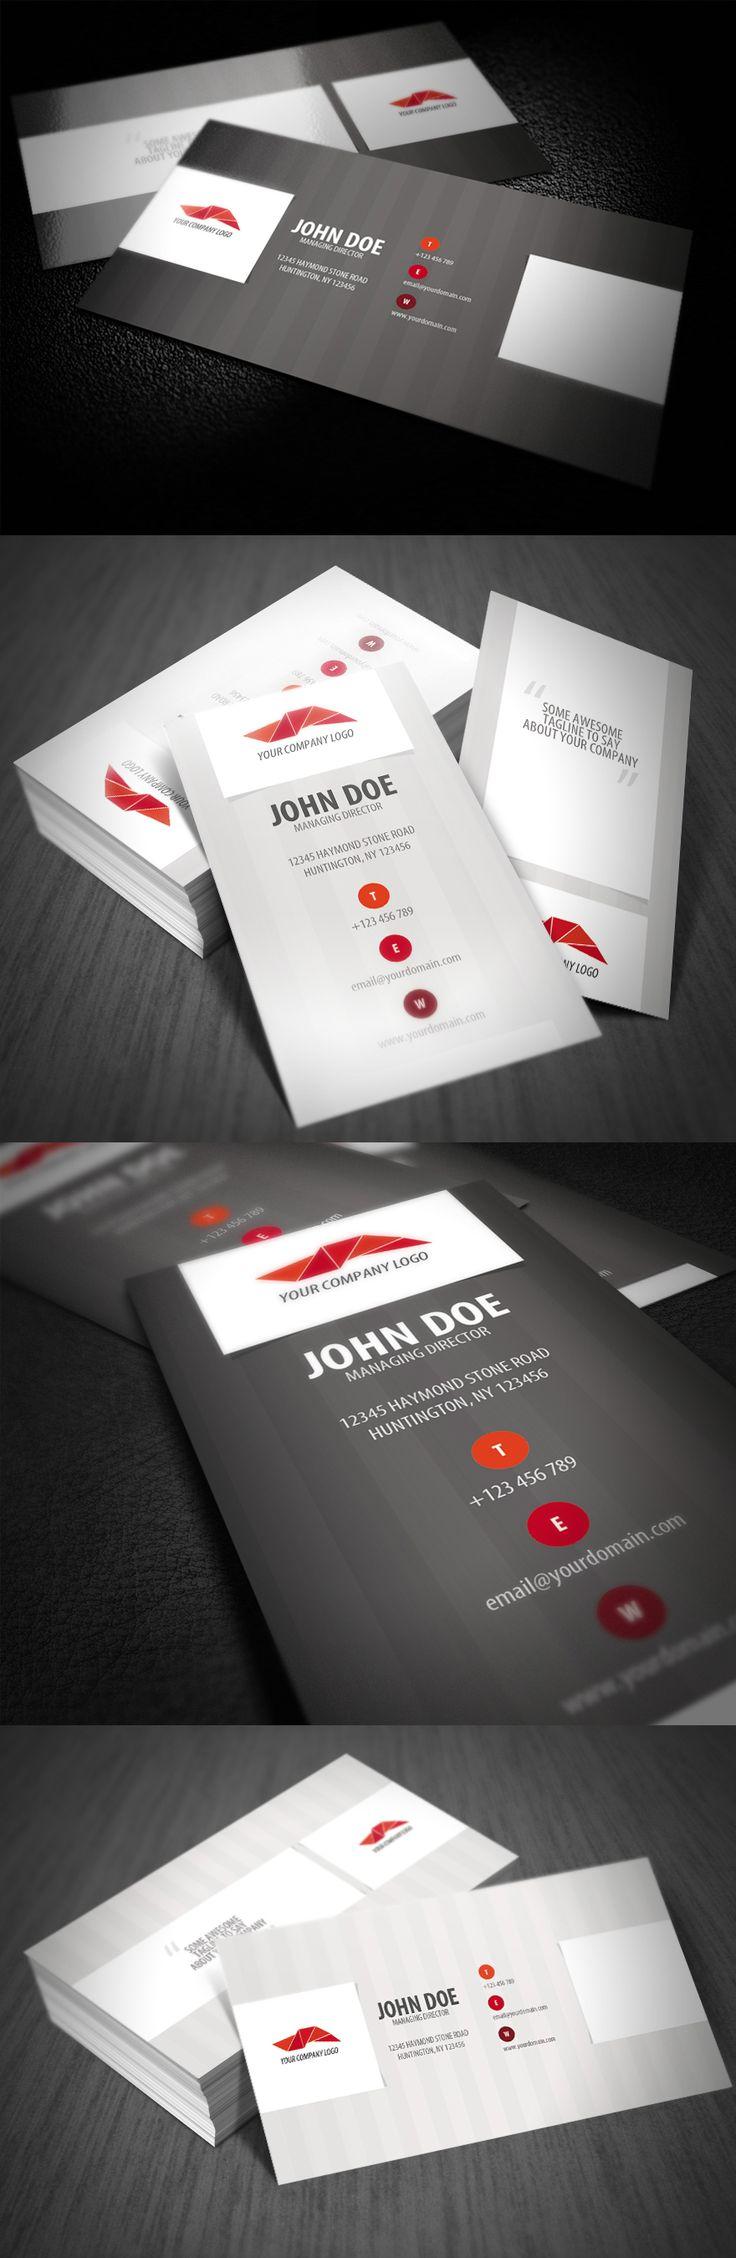 http://creattica.com/business-cards/stripe-style-business-card/68395